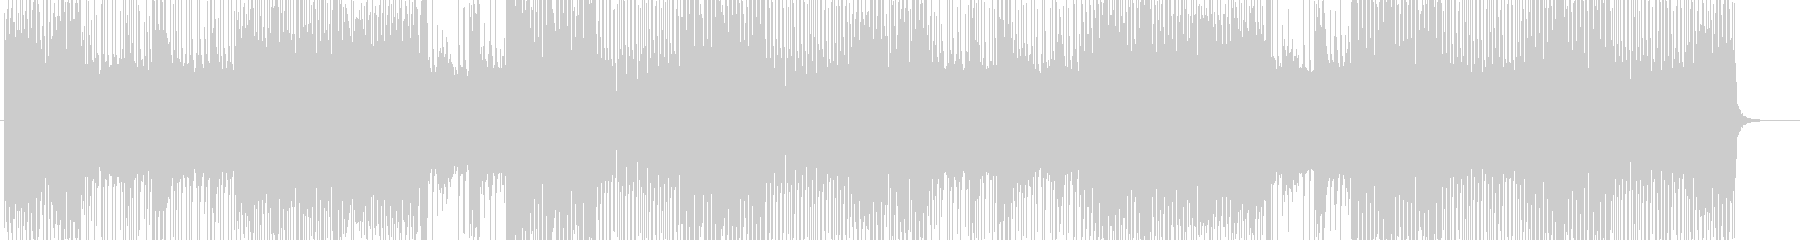 DEATH METAL BGM111の未再生の波形